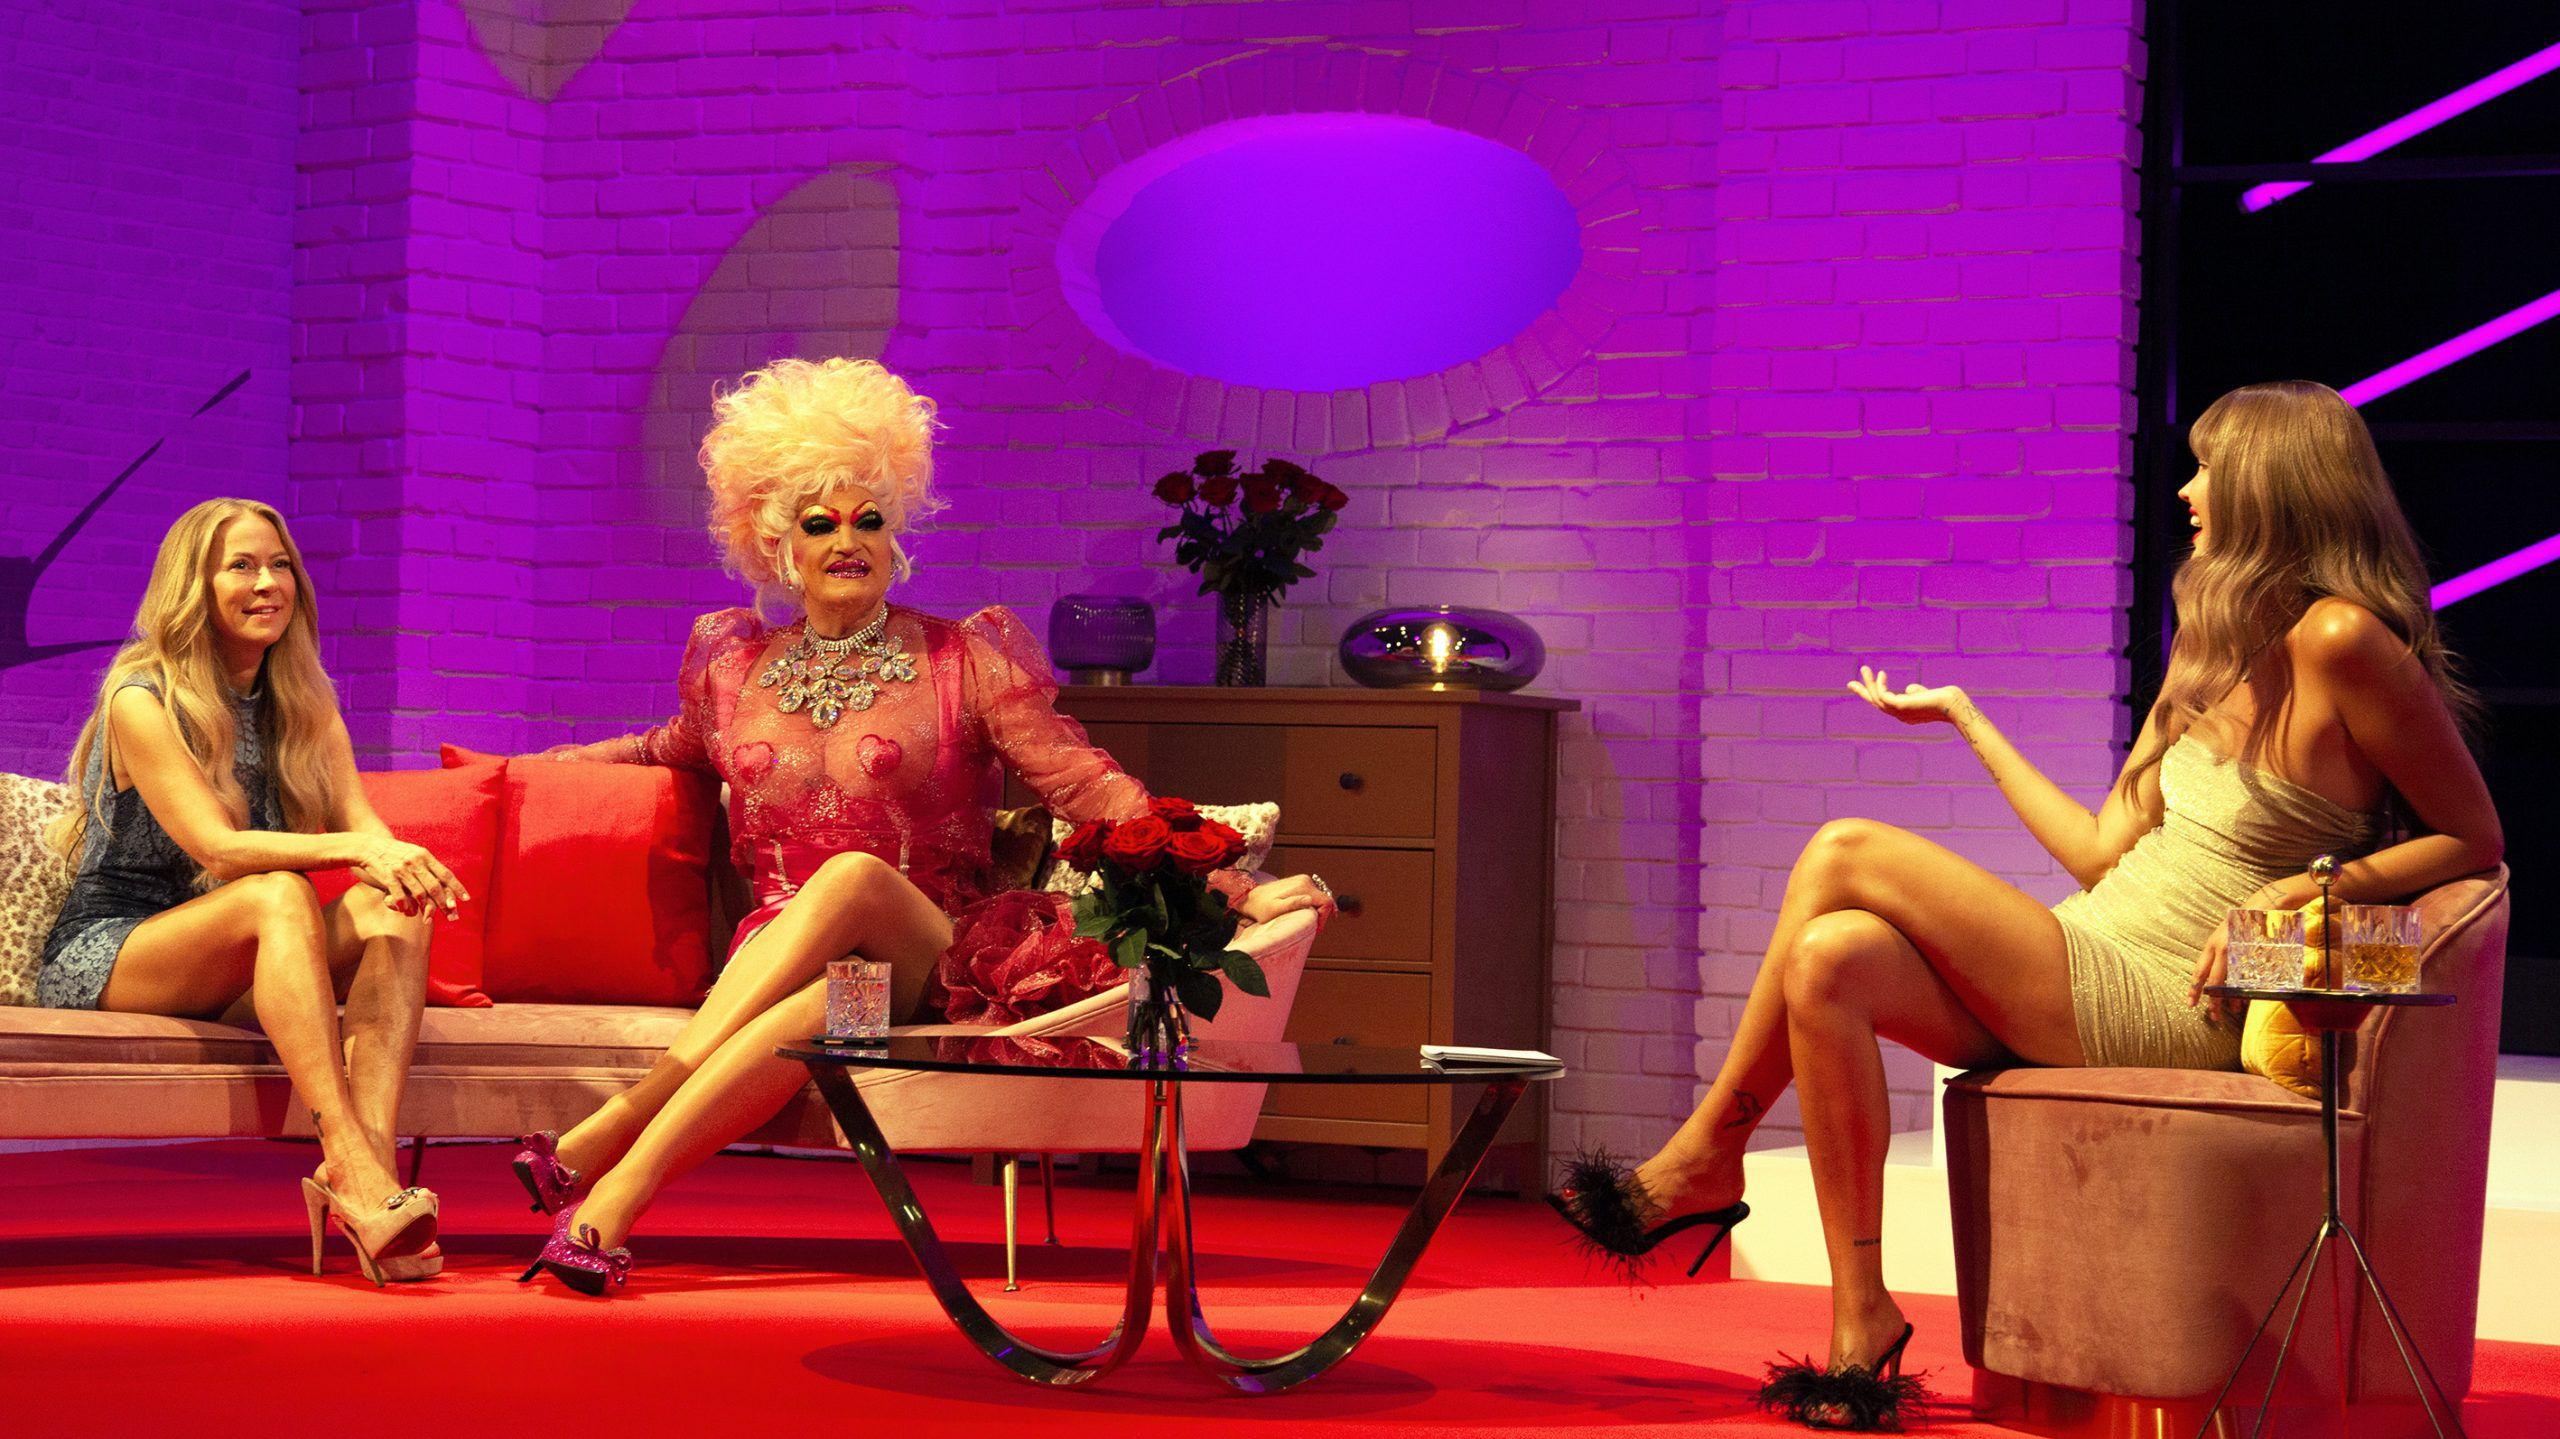 """Peep!"": Die Kult-Erotikshow feiert großes Jubiläum"